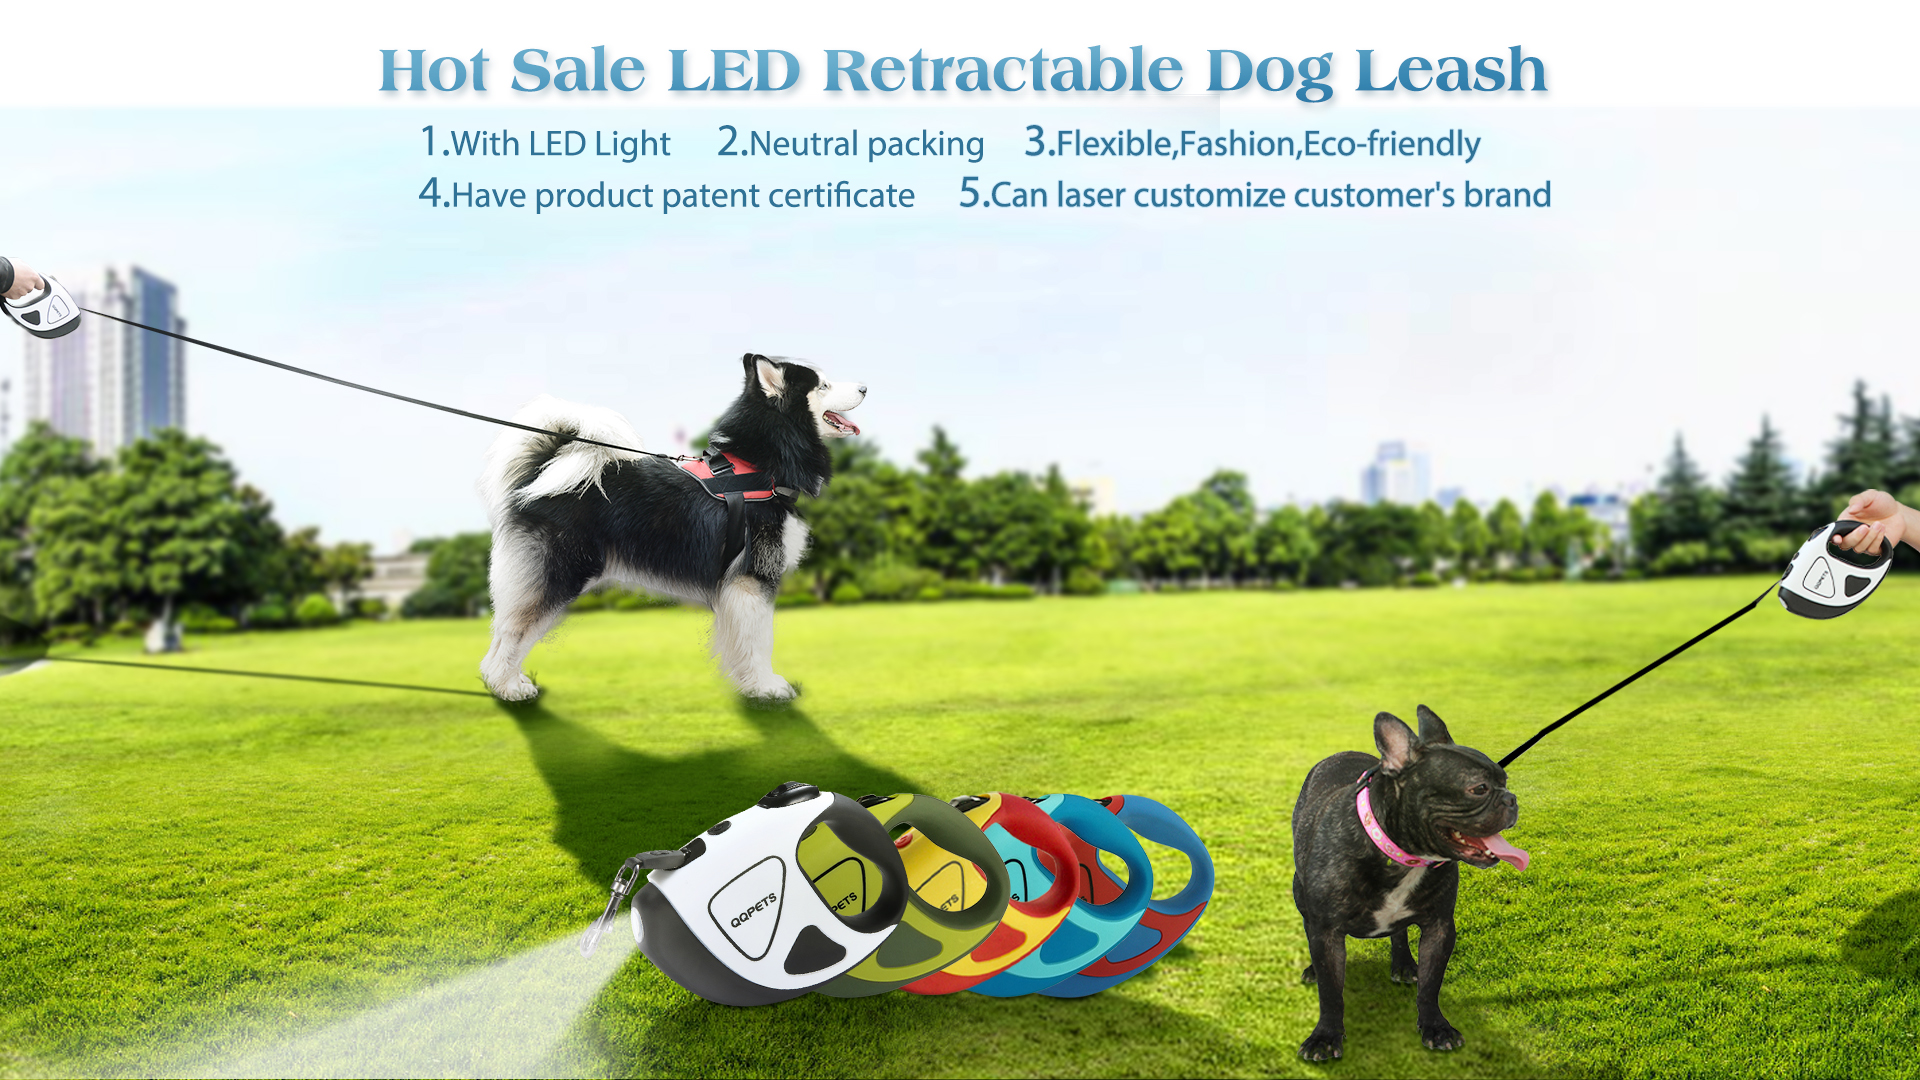 Customized new style wholesale led retractable dog leash